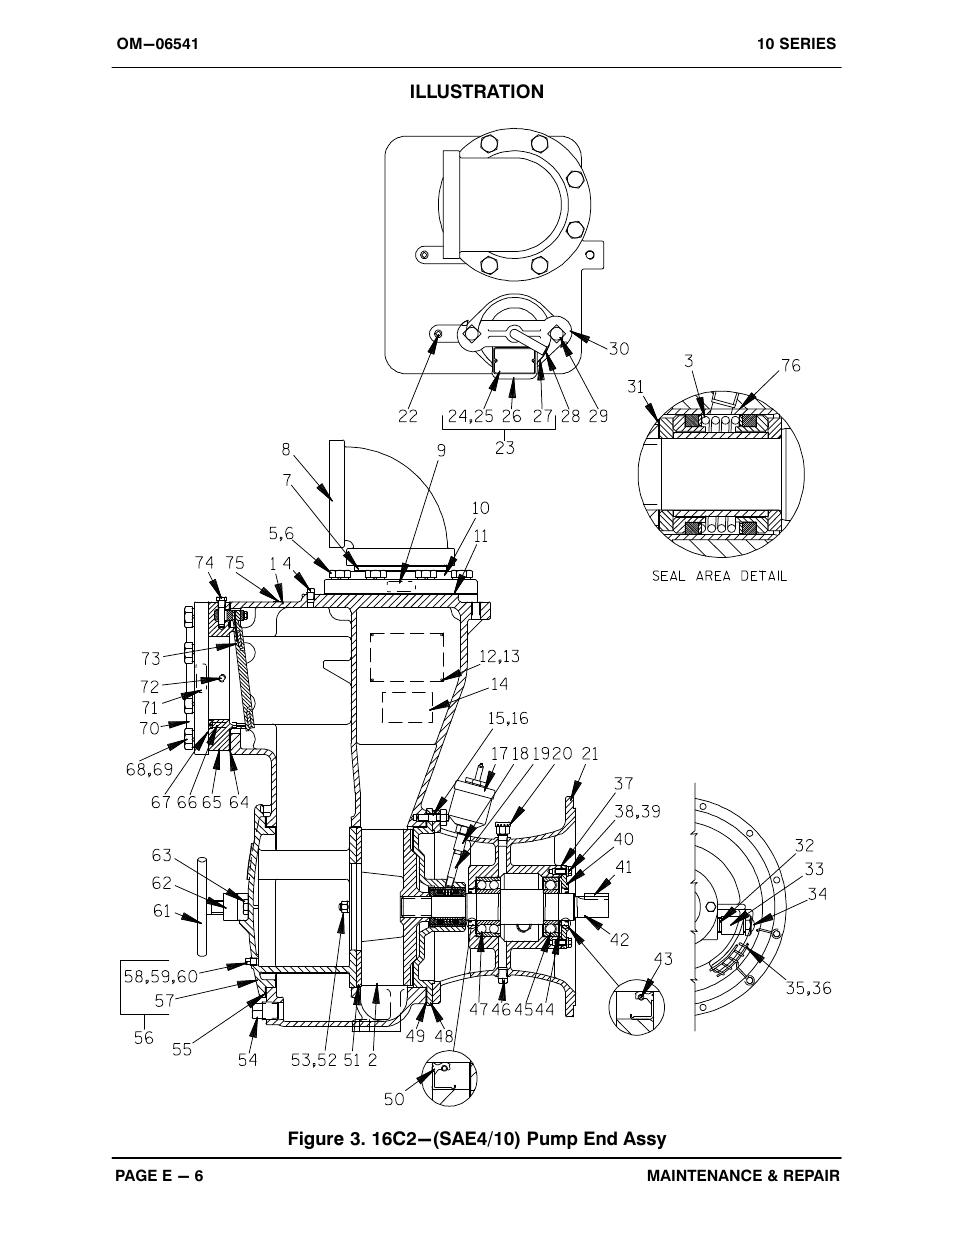 Gorman-Rupp Pumps 16C2-4045T 1514991 and up User Manual